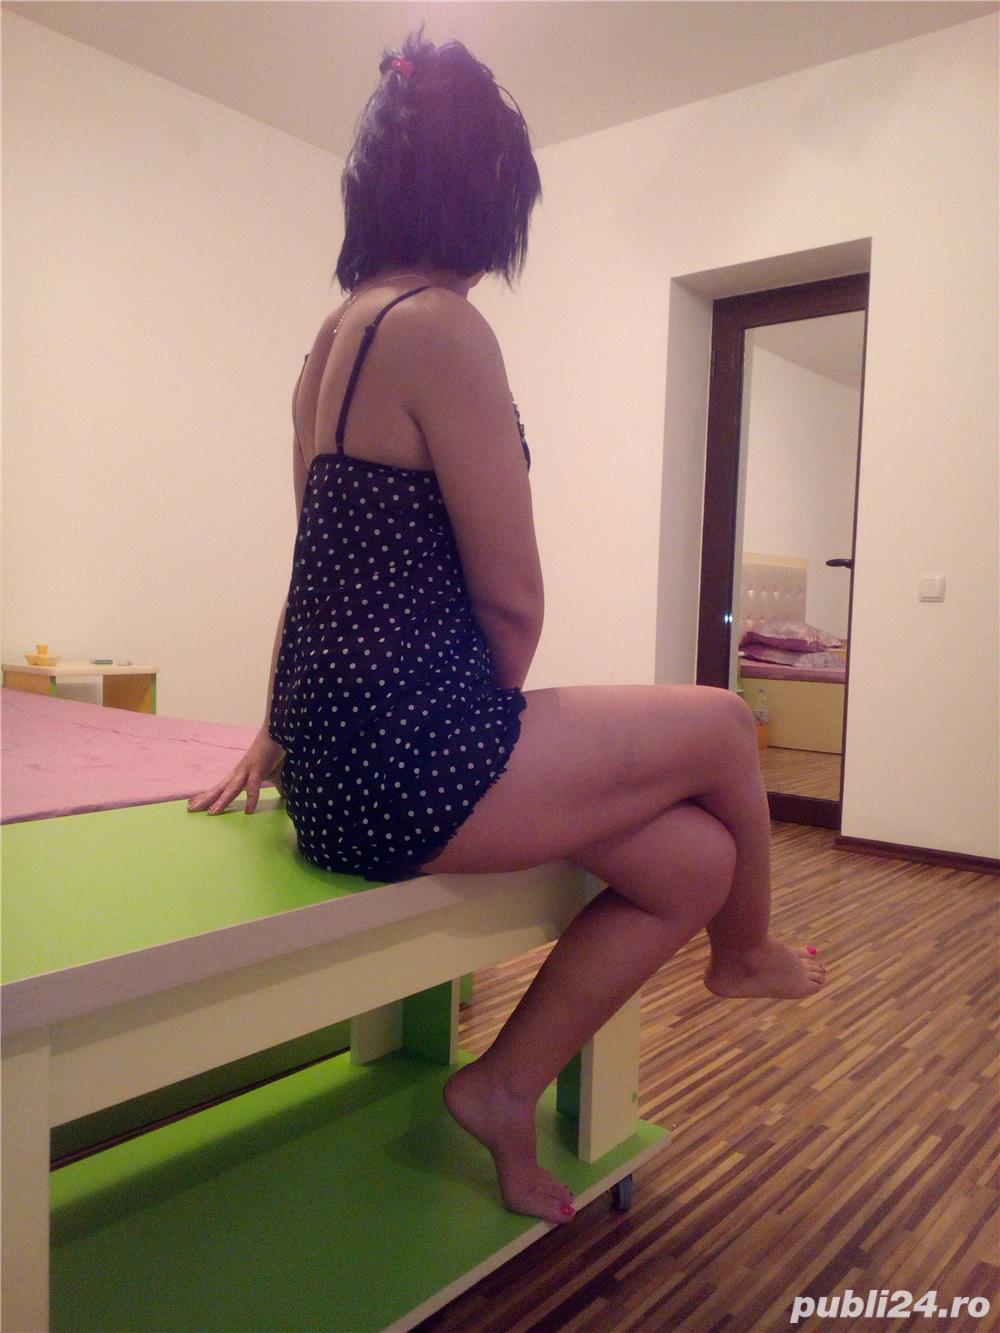 Buna sunt vyky,o fata dulce si cu bun simt,poze